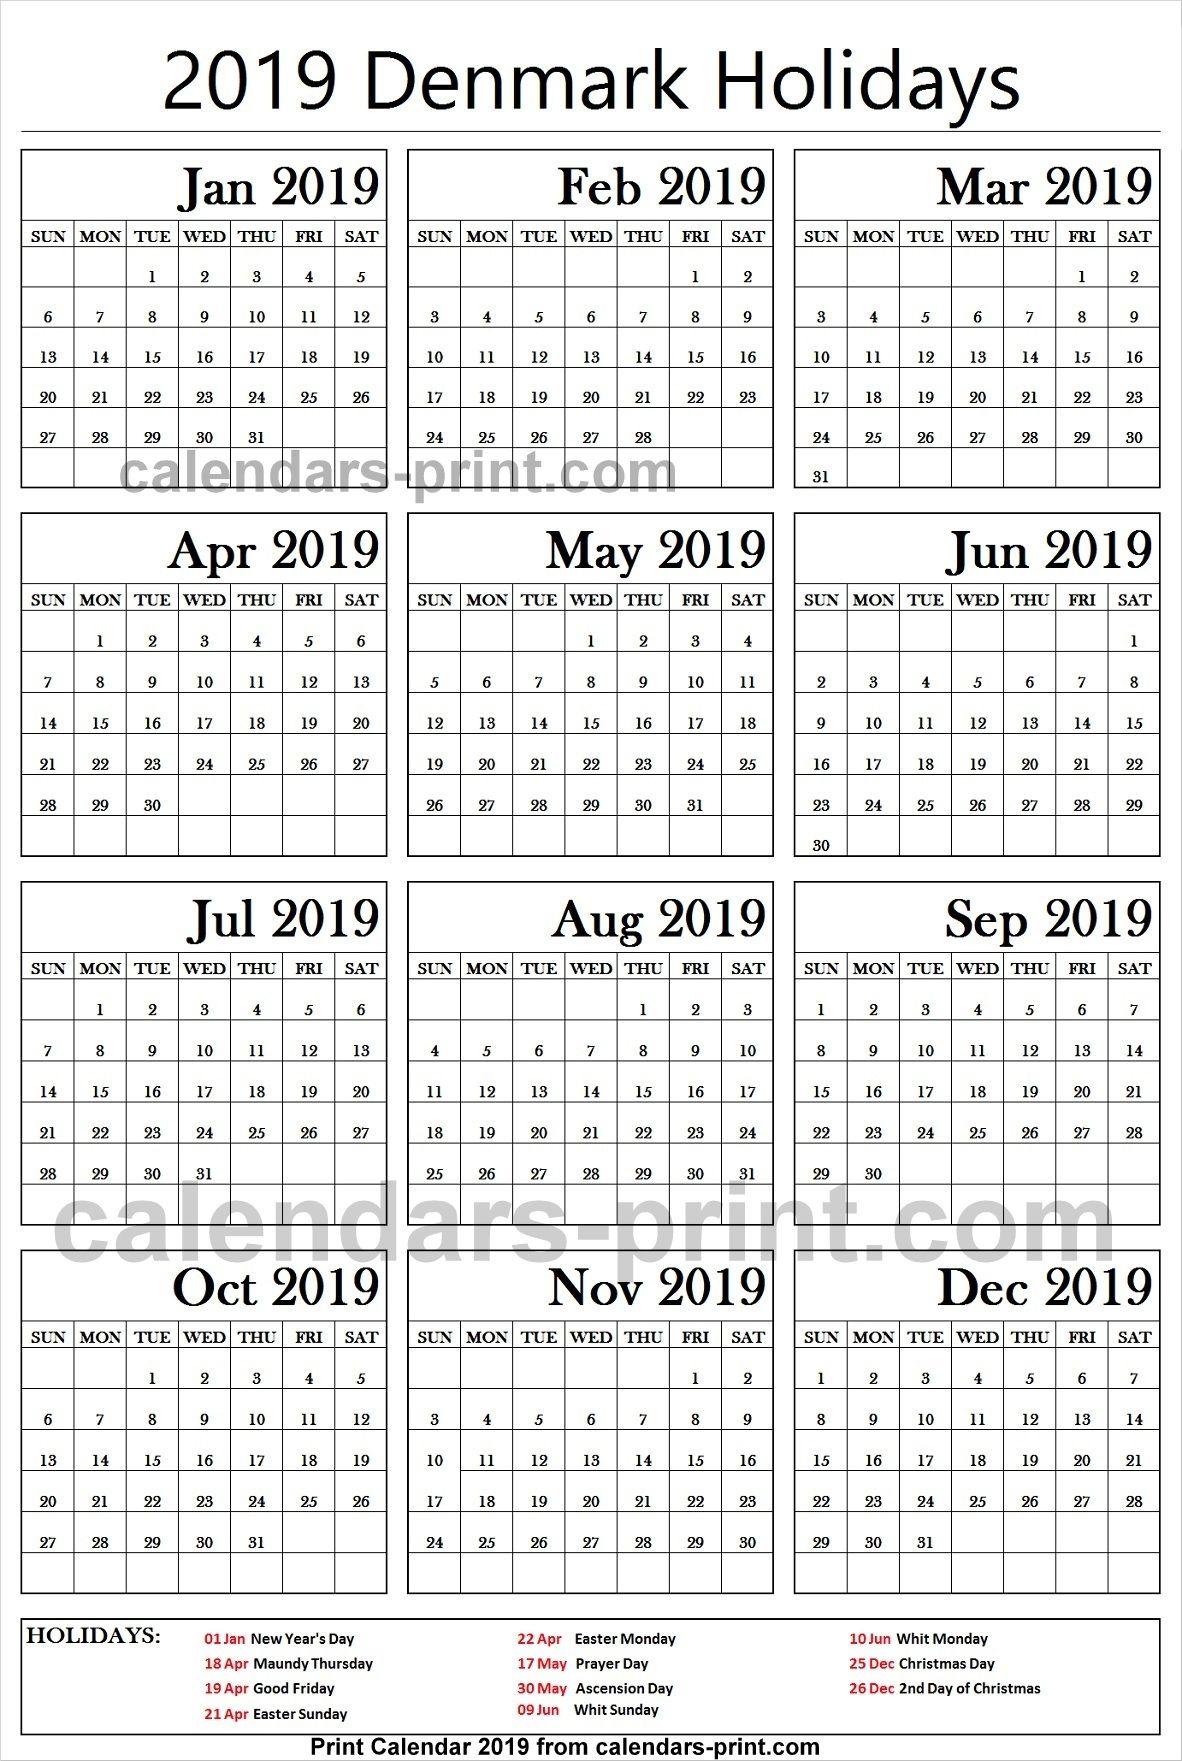 Christmas Holidays 2019 Calendar.2019 Bank Holidays Denmark Holidays Calendar 2019